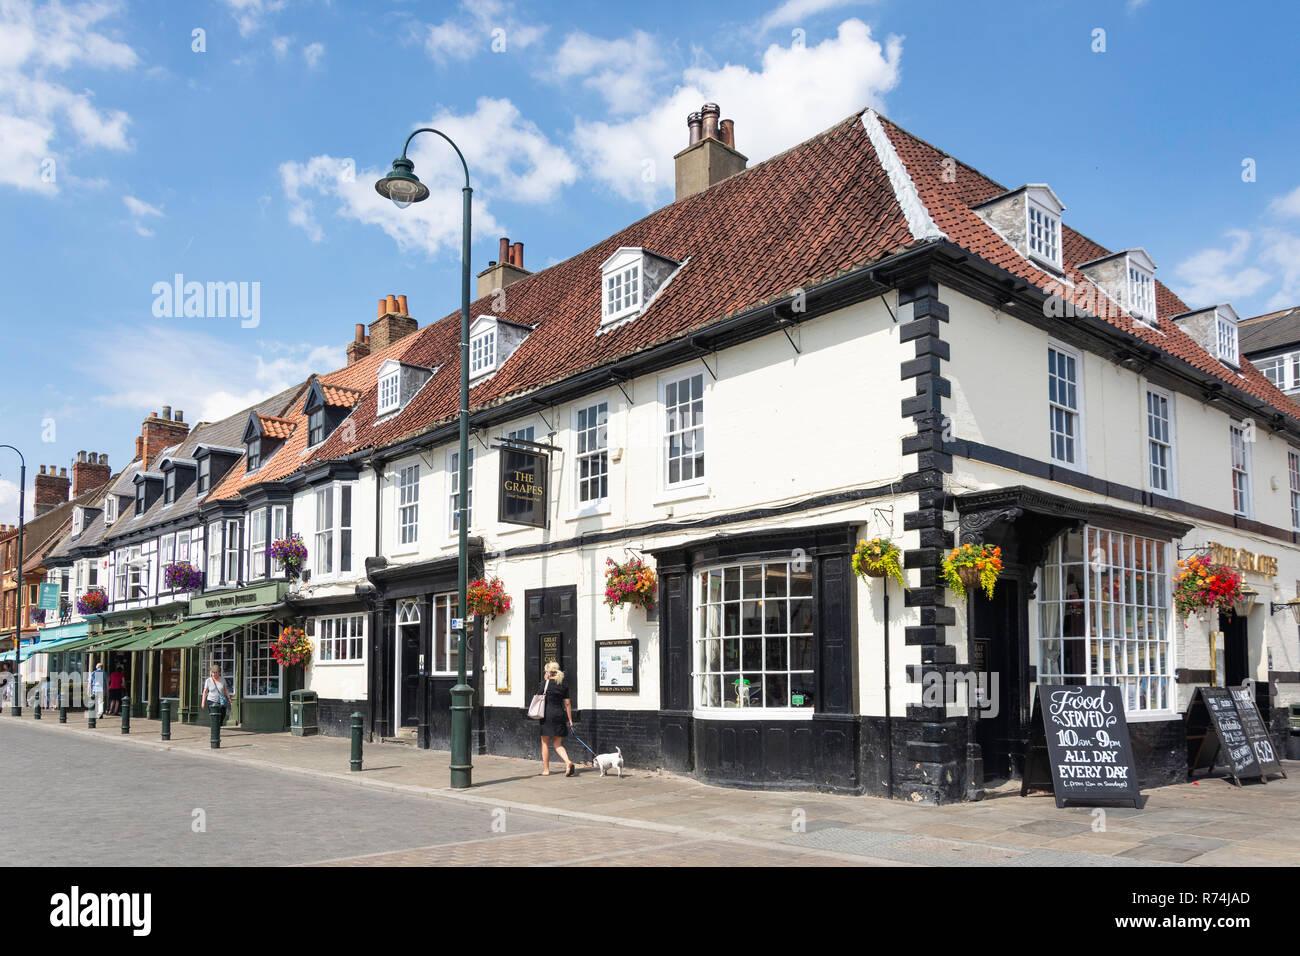 The Grapes Pub, Saturday Market, Beverley, East Riding of Yorkshire, England, United Kingdom - Stock Image